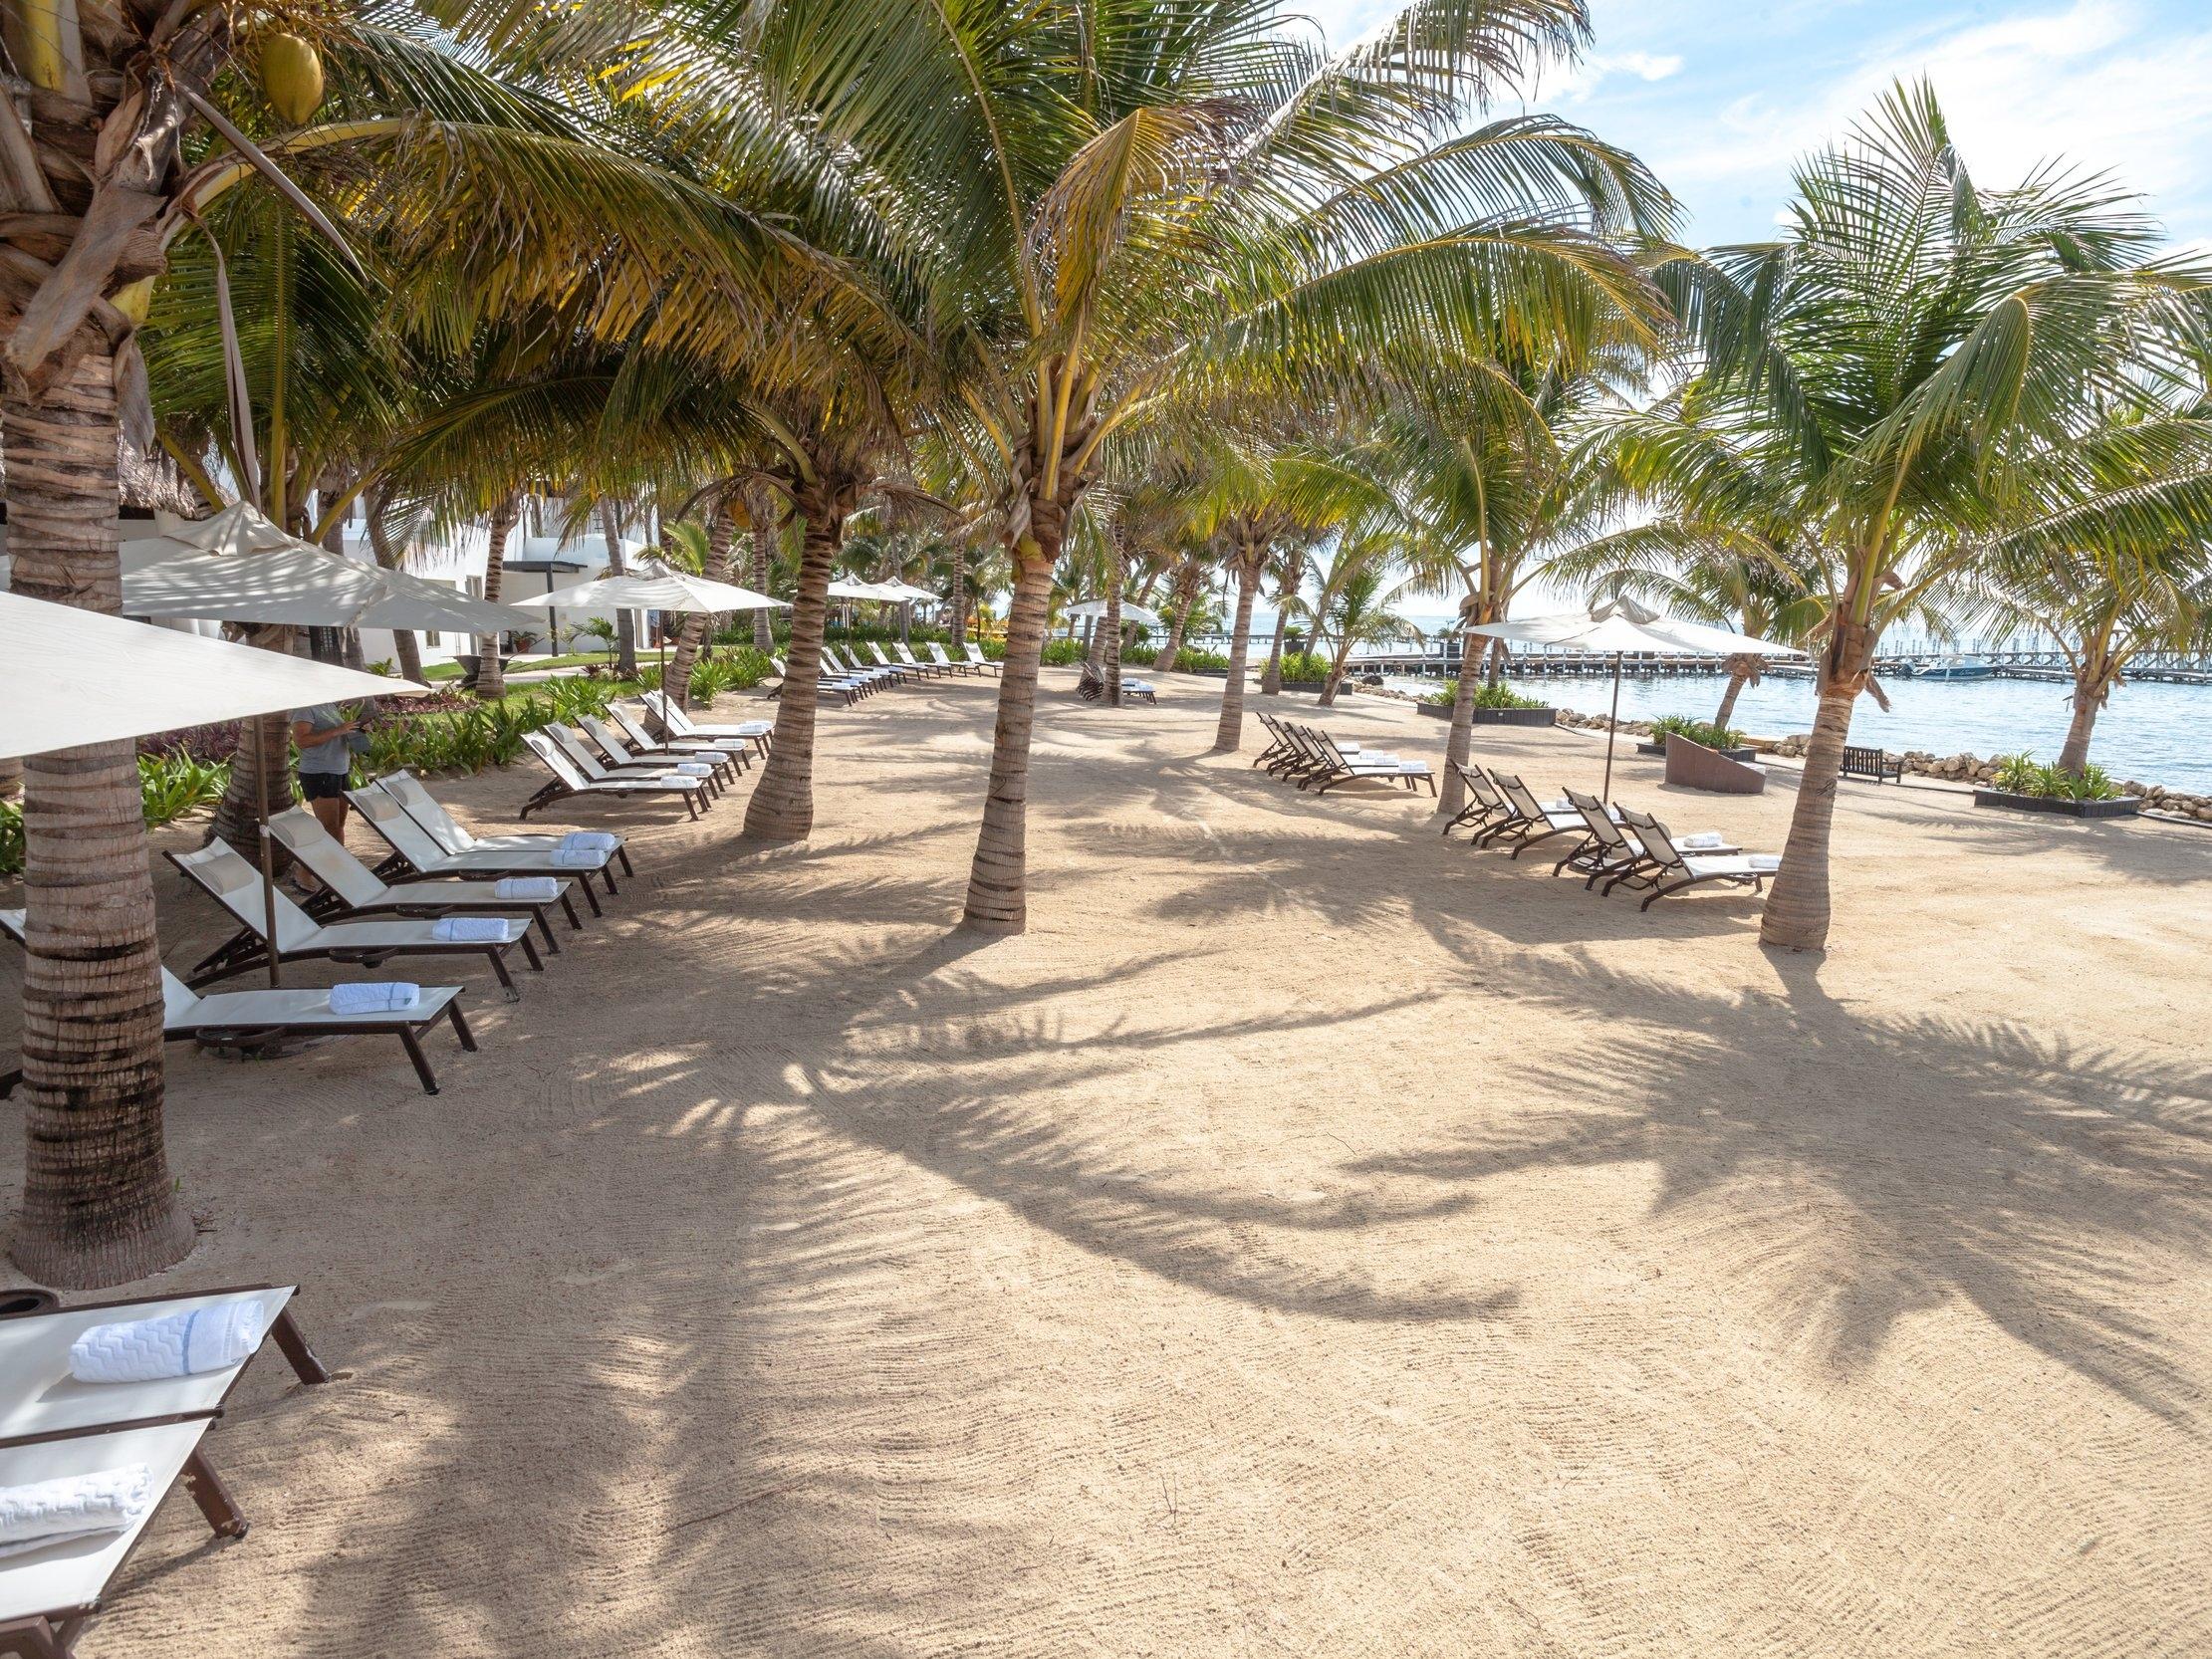 Beach at Las Terrazas Resort